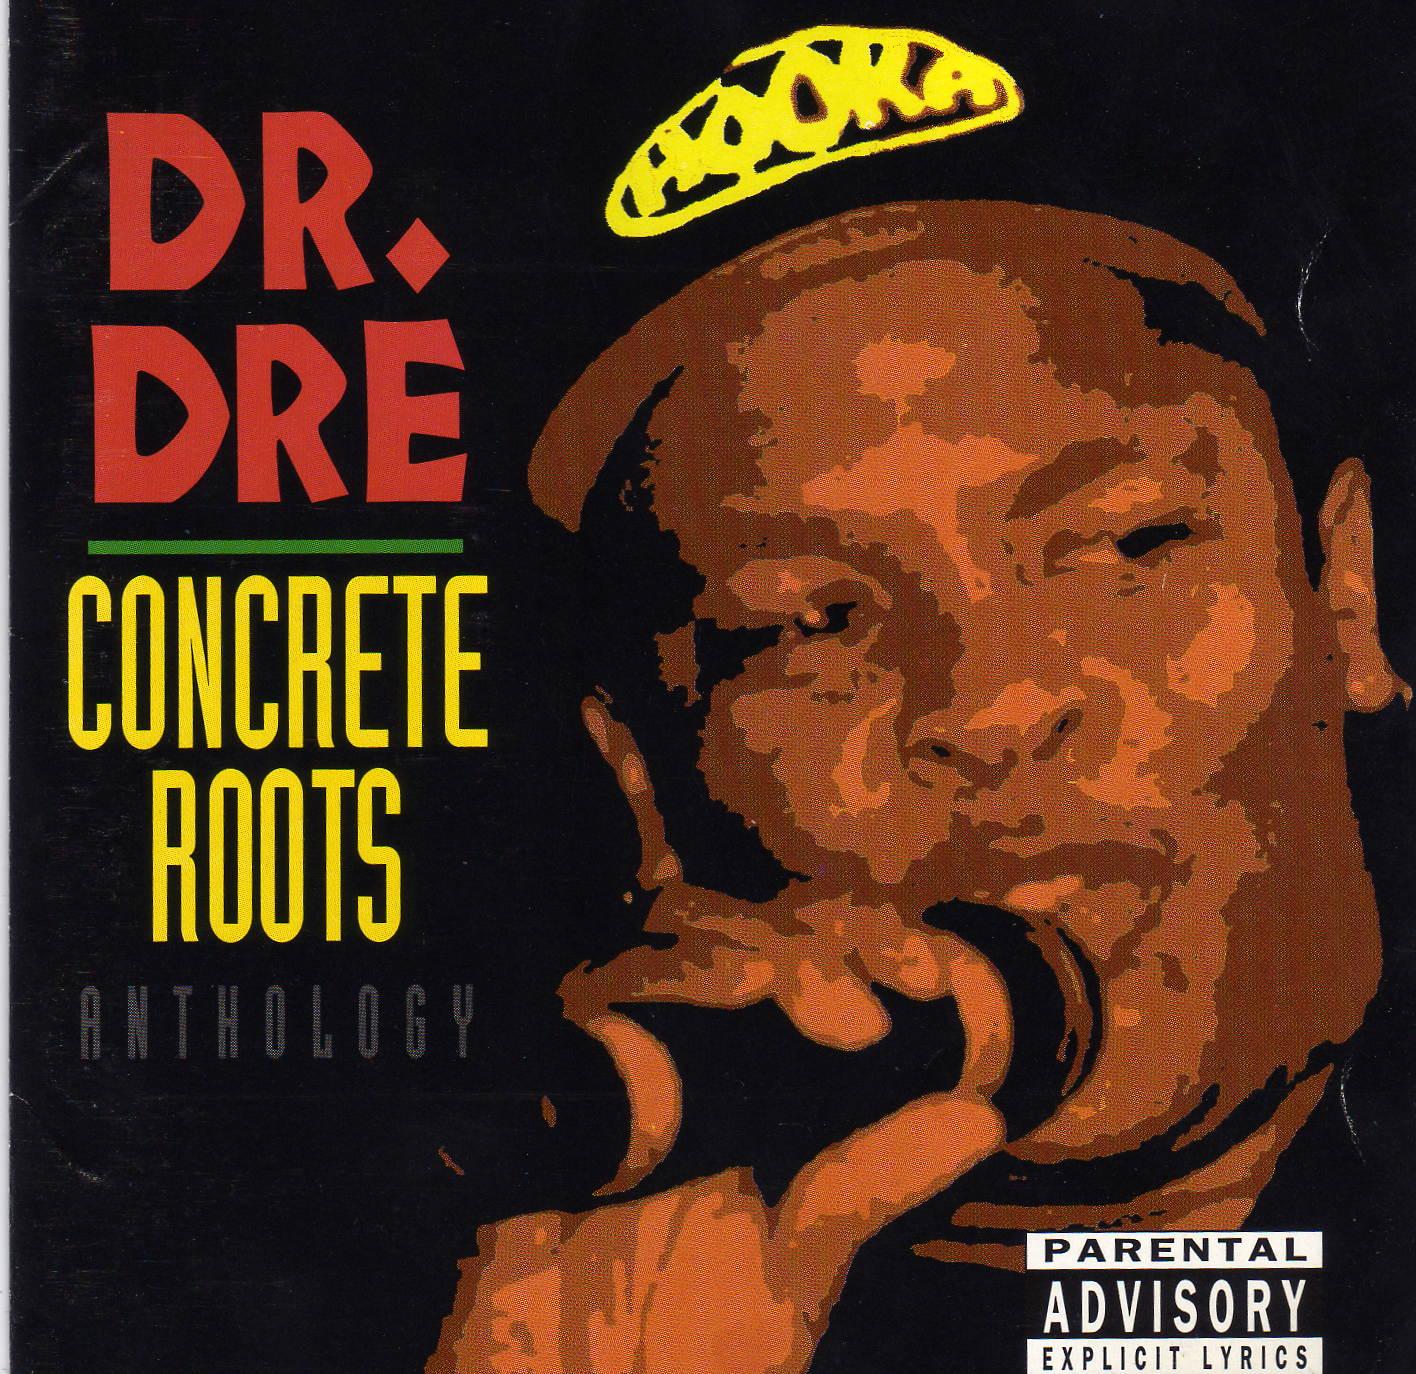 Dr Dre 2001 The Chronic Zip Sharebeast